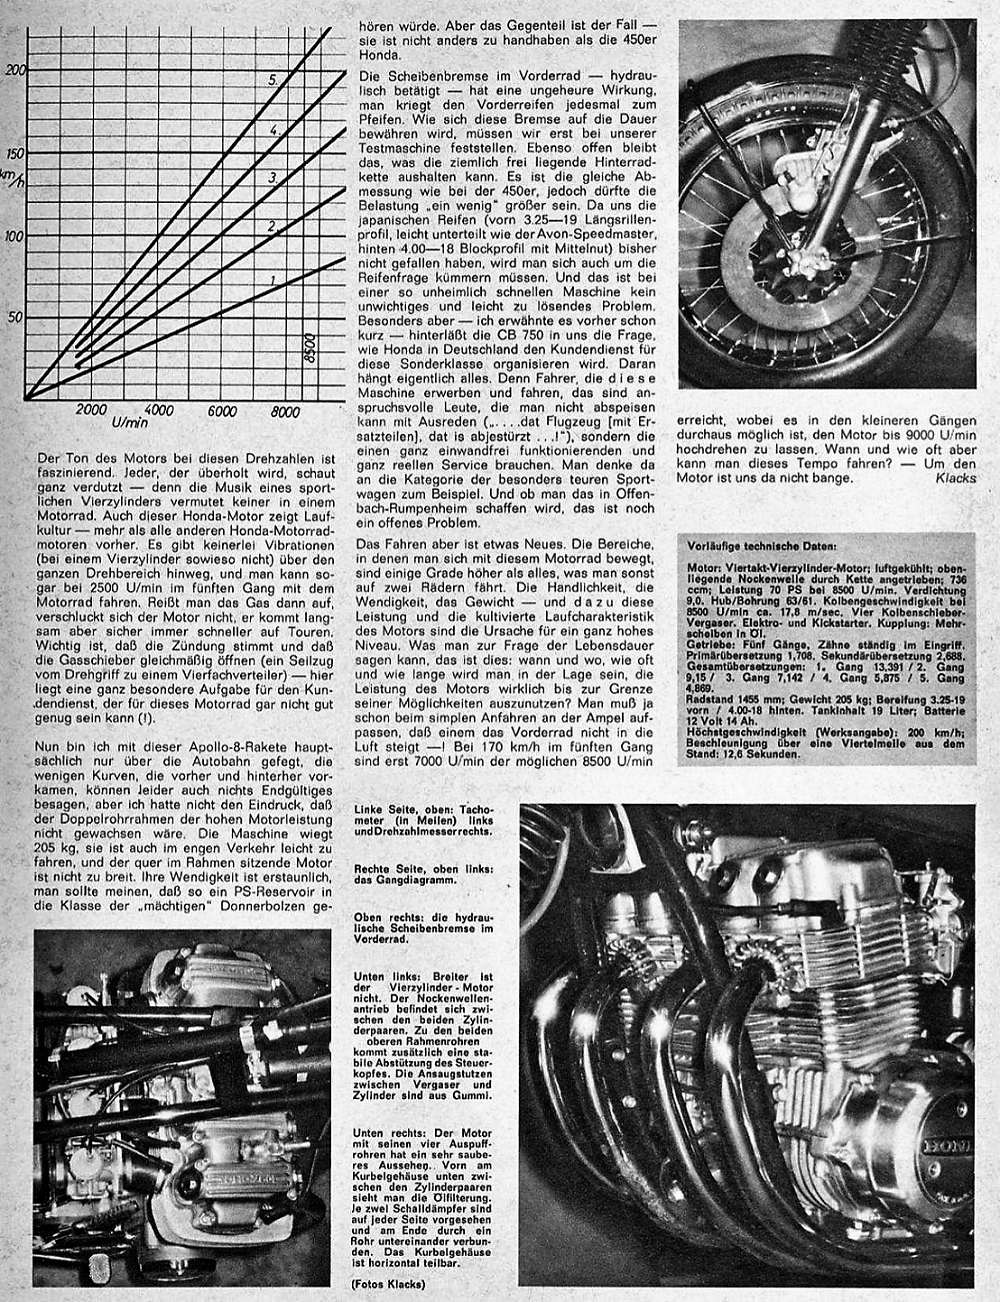 1968 Honda 750 road test.2.jpg